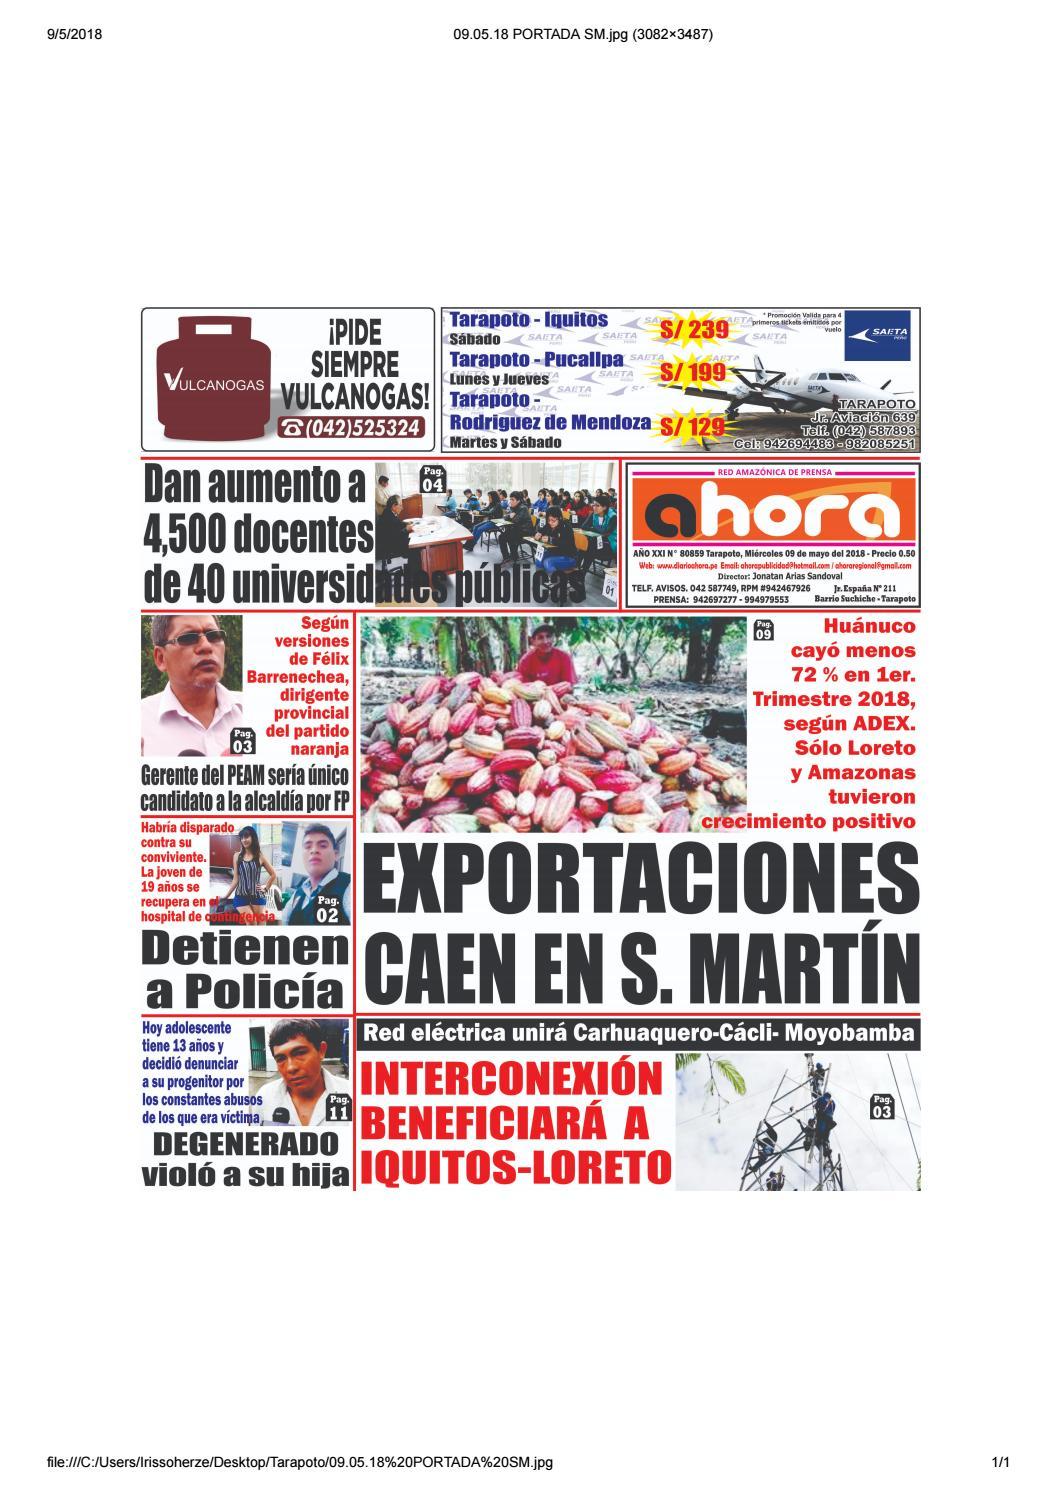 Tarapoto 09 de mayo del 2018 by Jonatan Arias - issuu